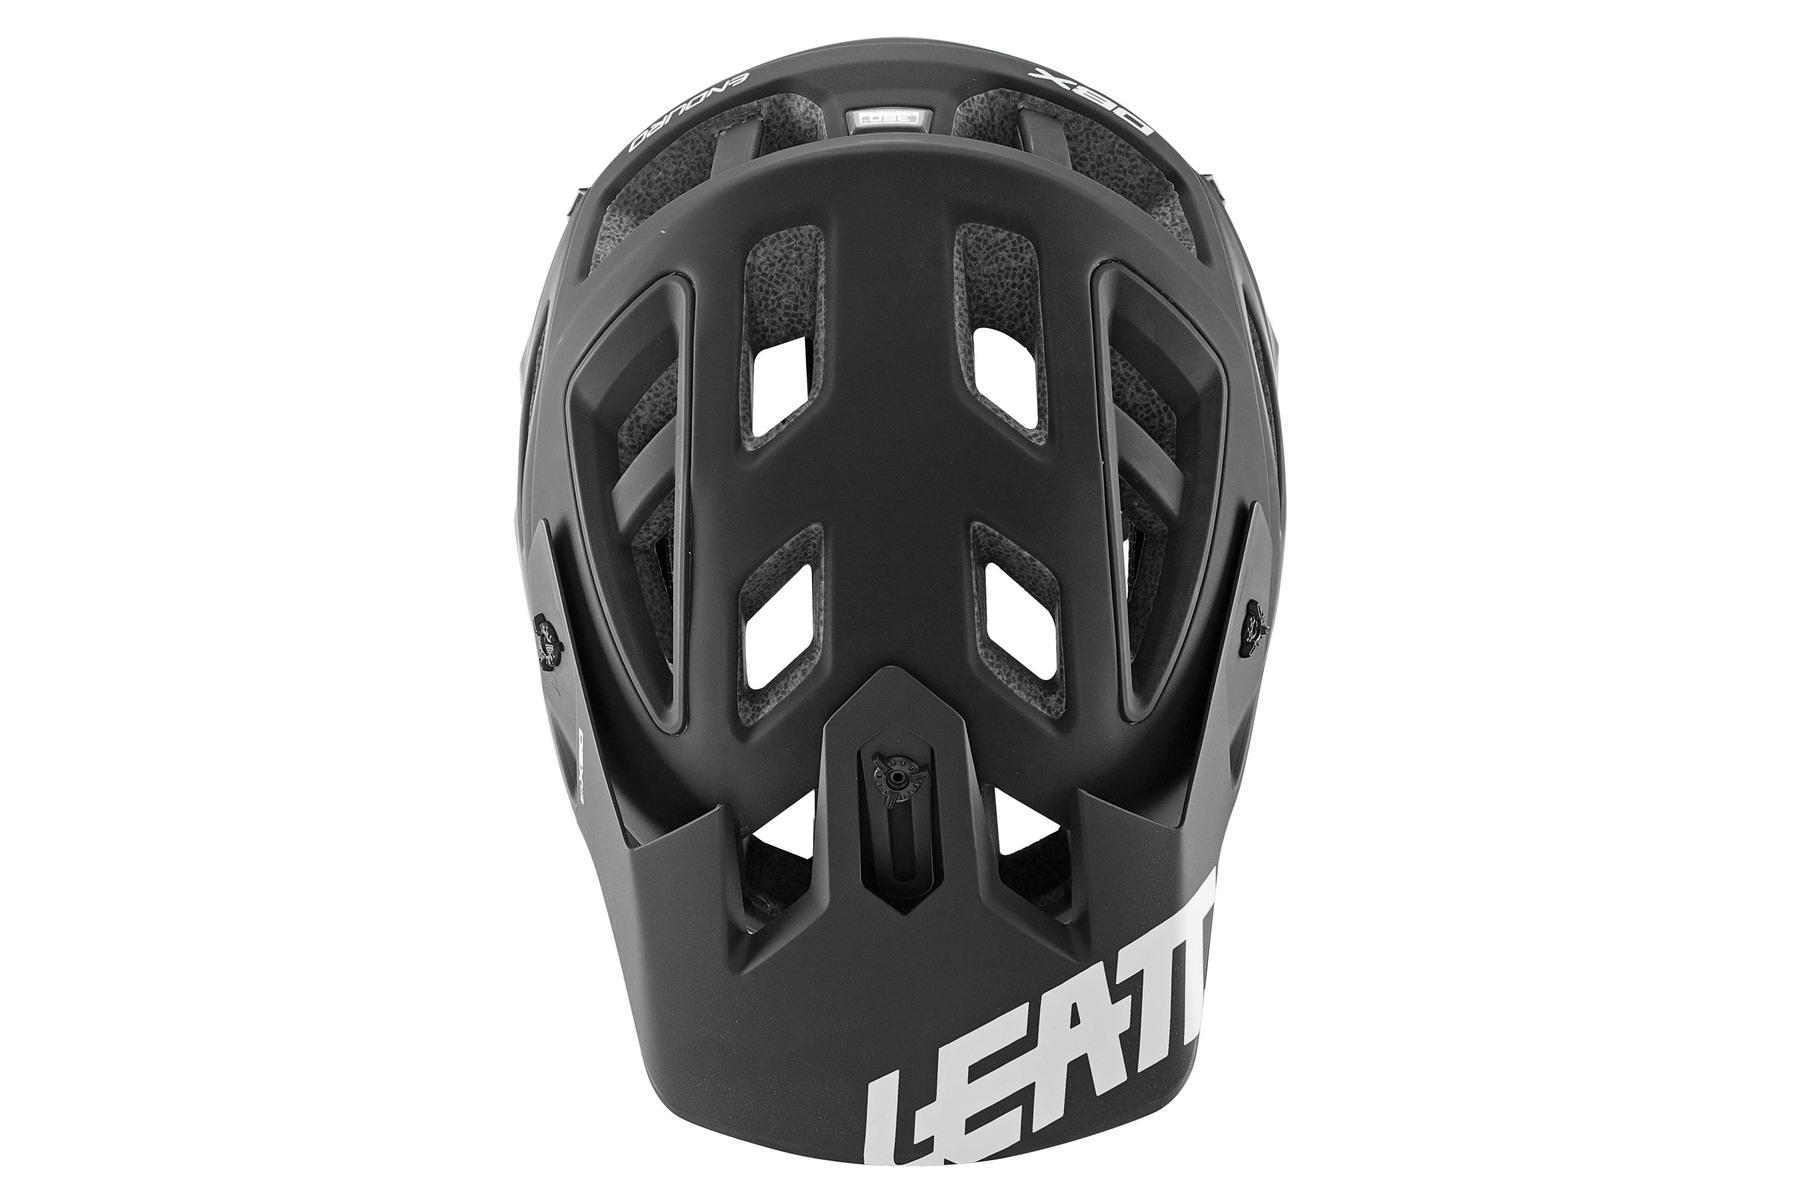 leatt dbx 3 0 enduro fullface helm mtb kaufen rose bikes. Black Bedroom Furniture Sets. Home Design Ideas